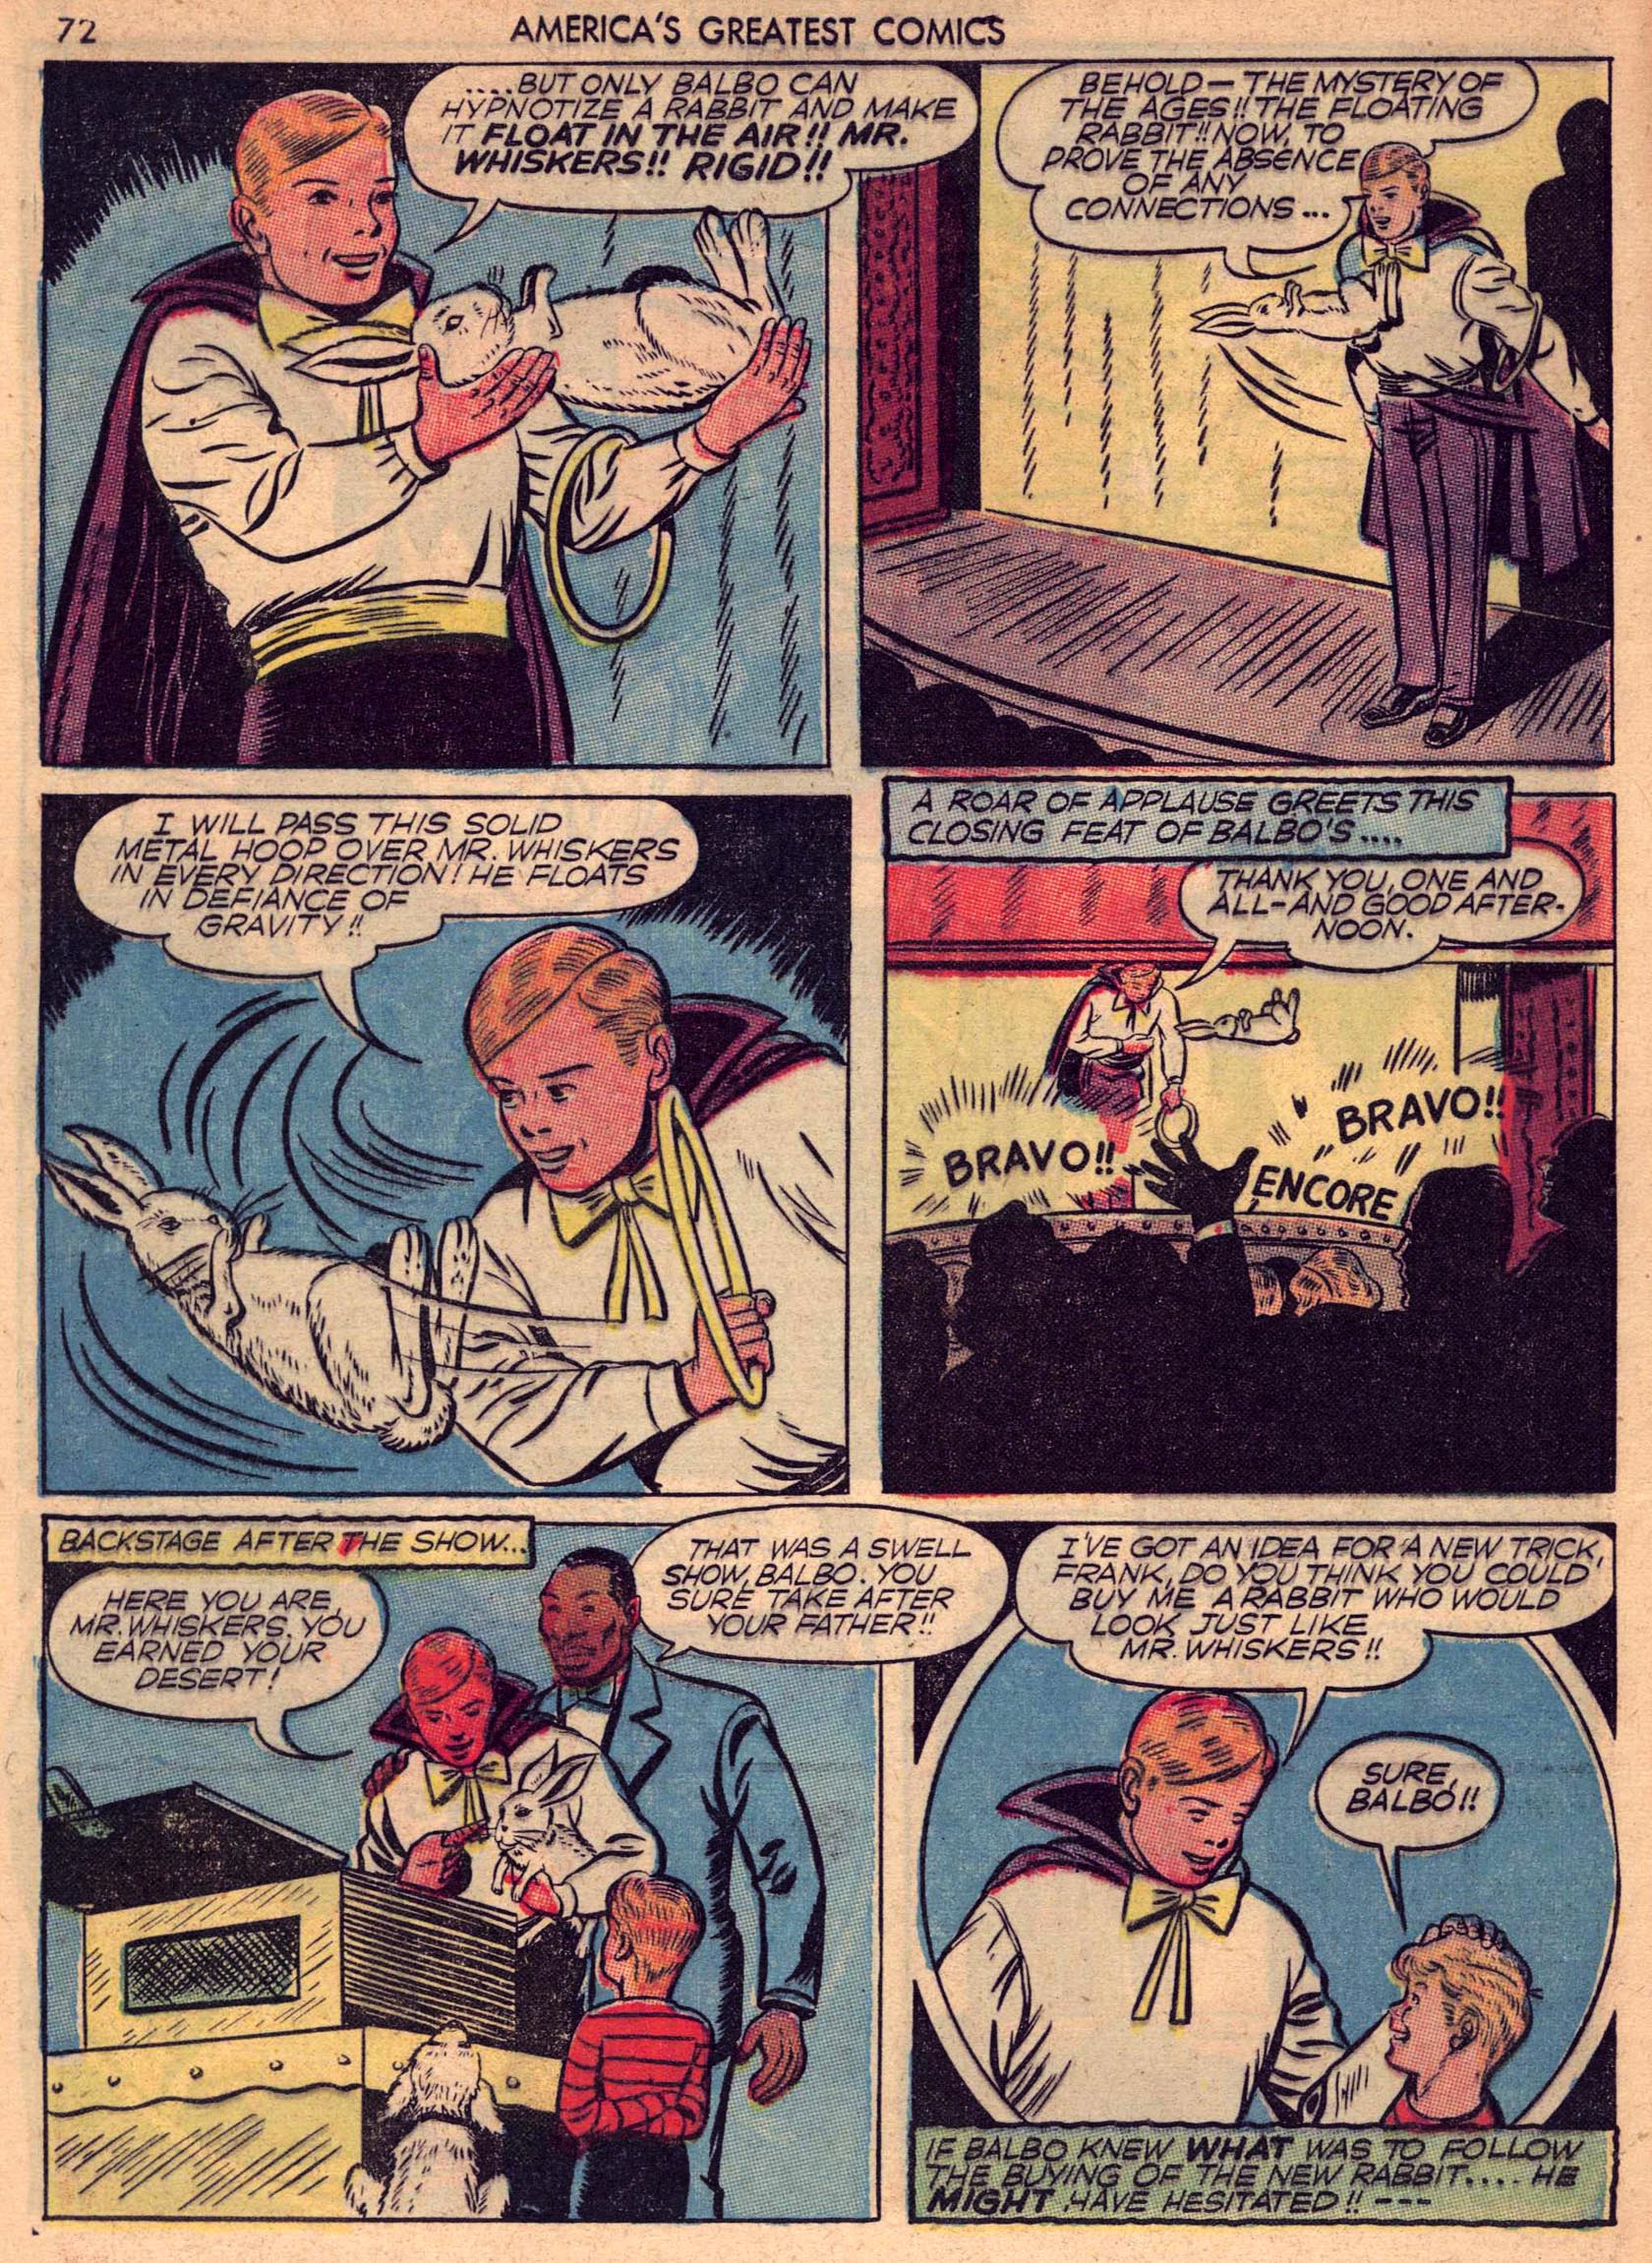 Read online America's Greatest Comics comic -  Issue #7 - 71